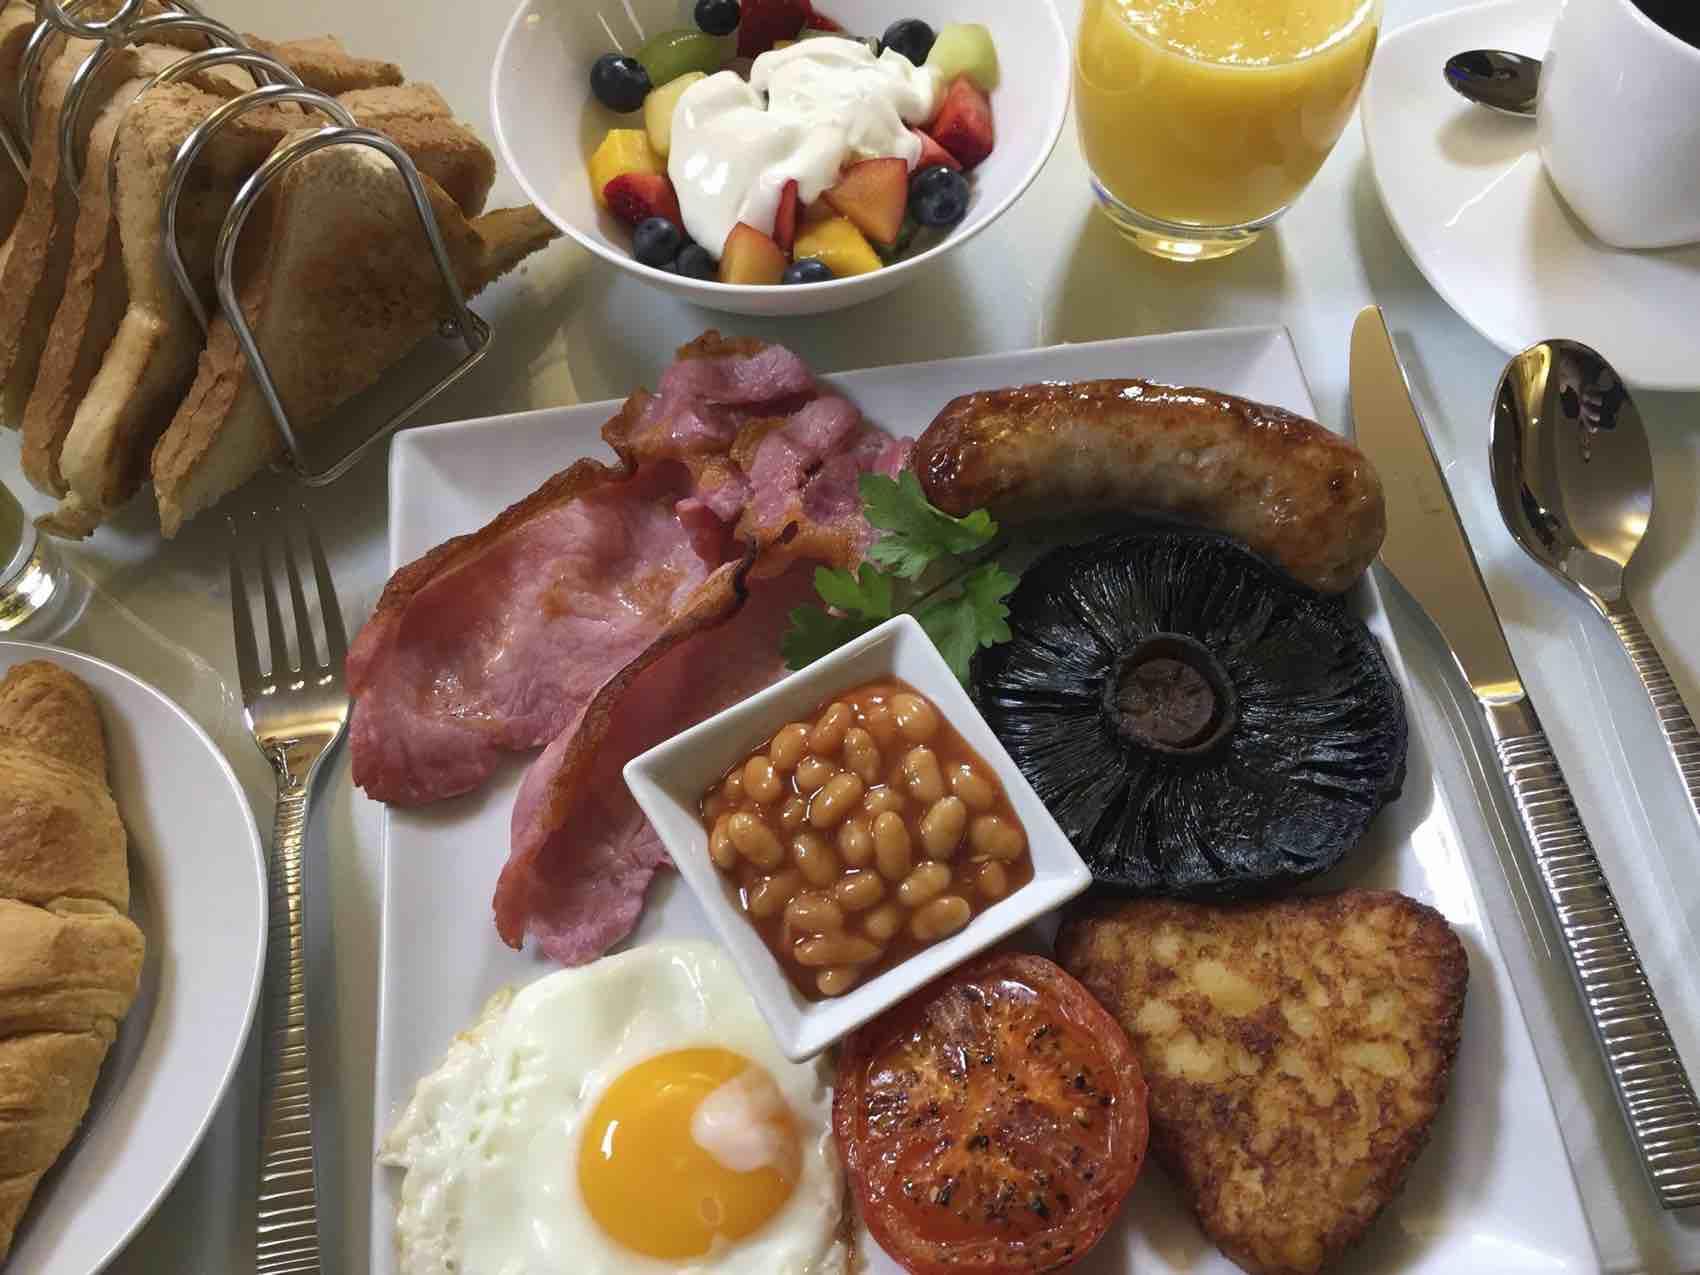 Good Morning: Nothing is like Full English Breakfast